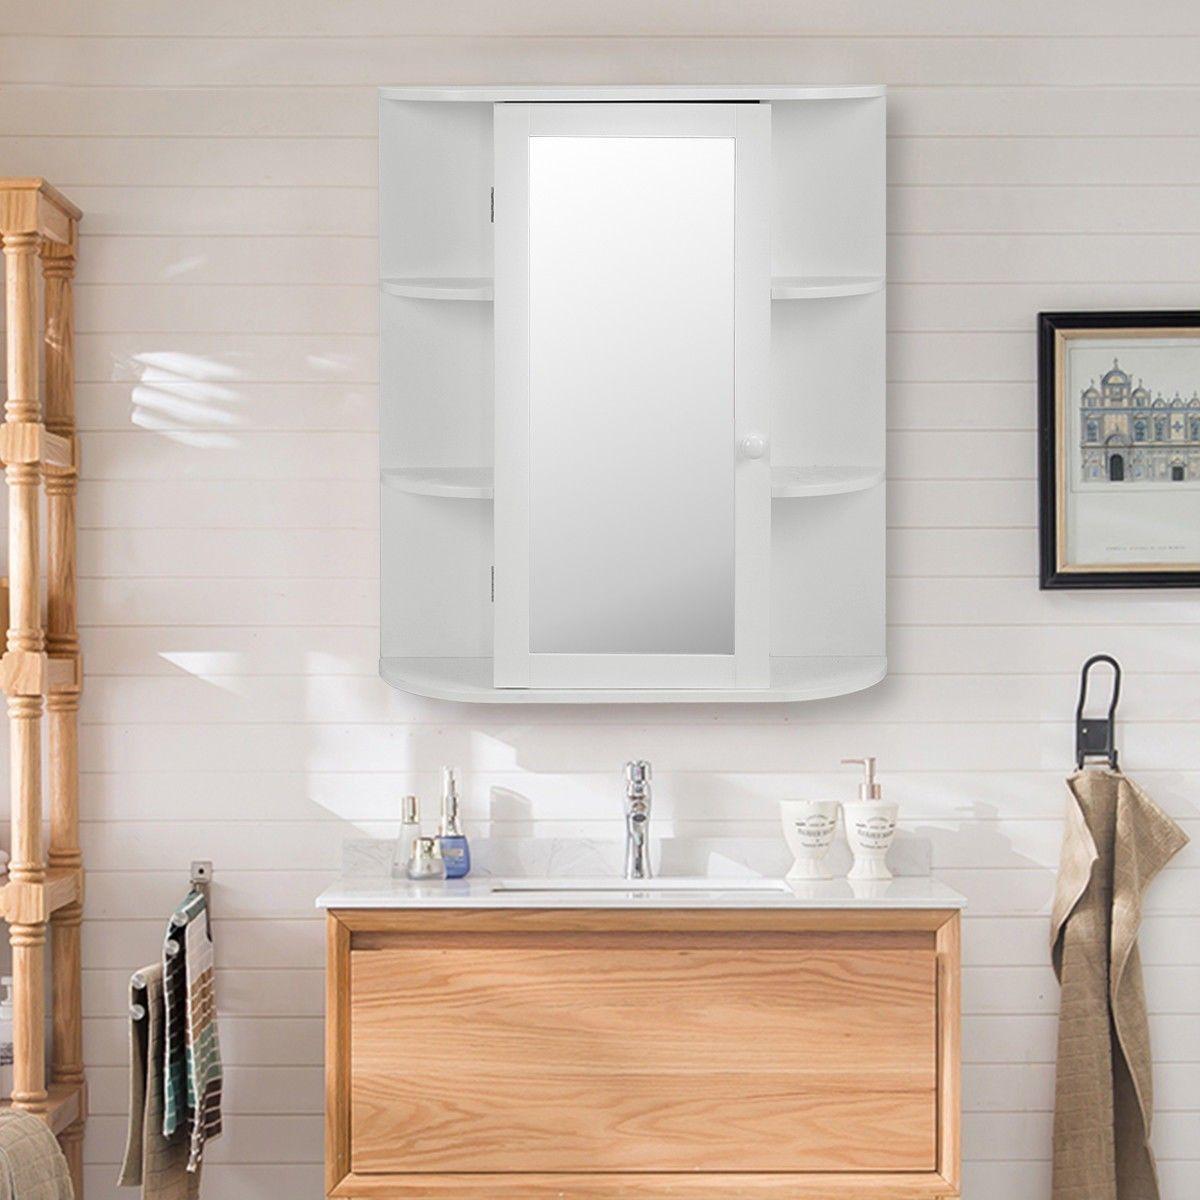 Costway Bathroom Wall Mounted Cabinet Shelf White Mirrored Door ...